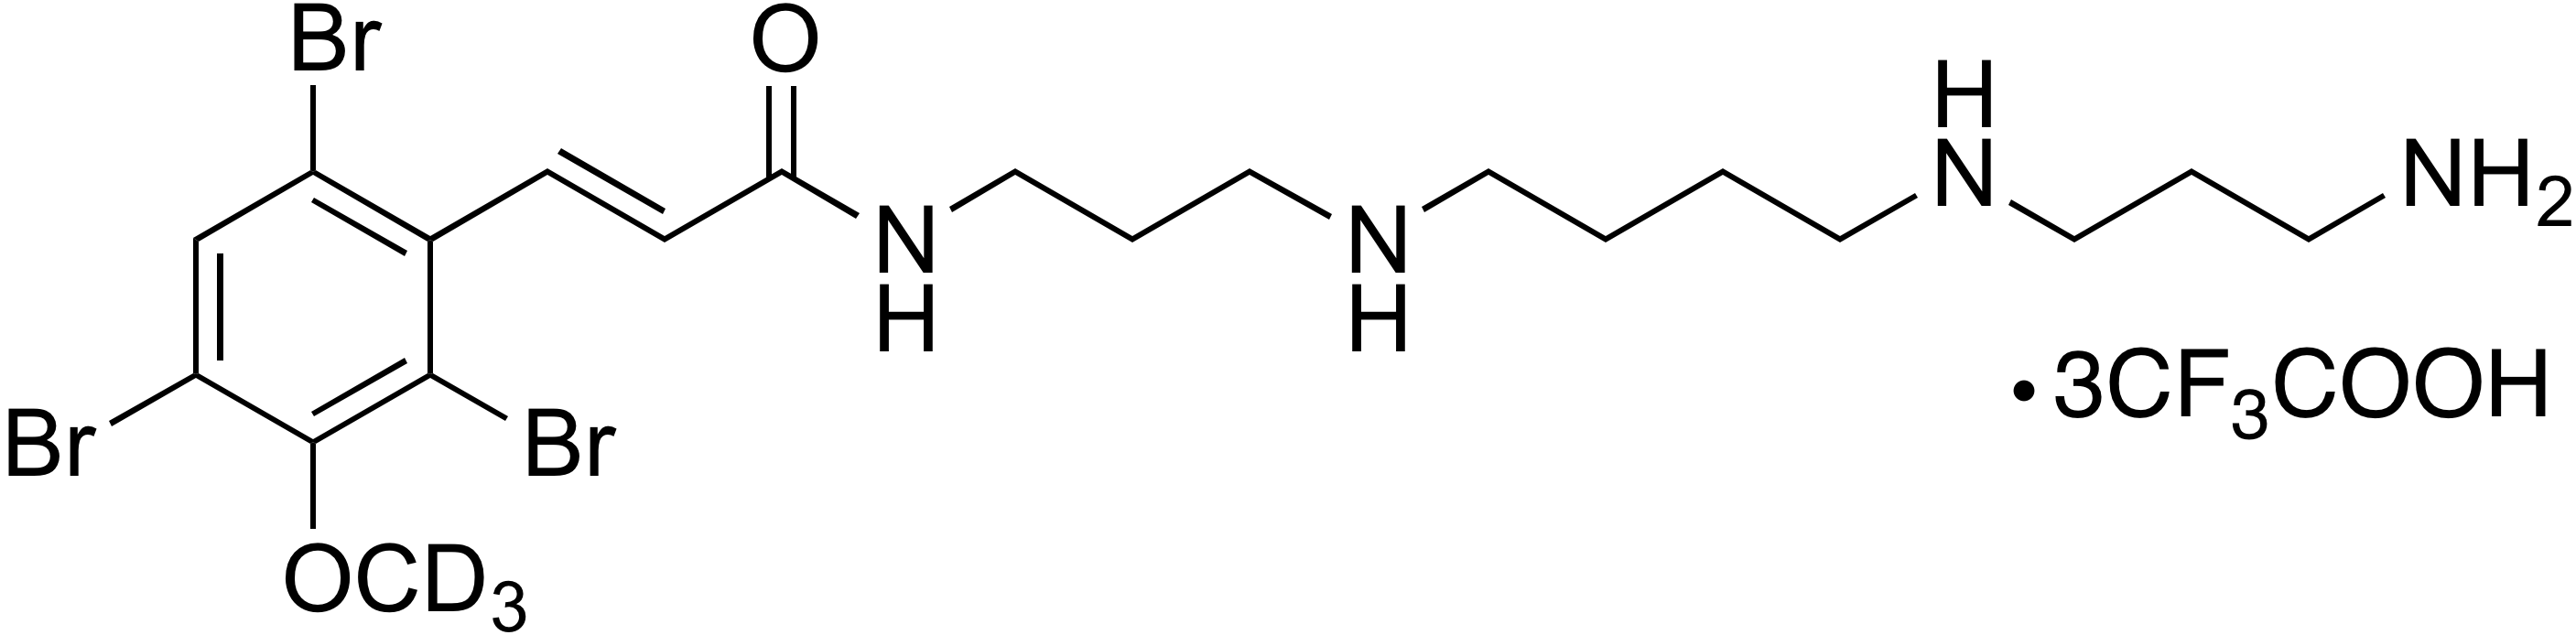 (E)-N-(3-((4-((3-Aminopropyl)amino)butyl)amino)propyl)-3-(2,4,6-tribromo-3-methoxy-d<sub>3</sub>-phenyl)acrylamidetrifluoroacetate (1:3)